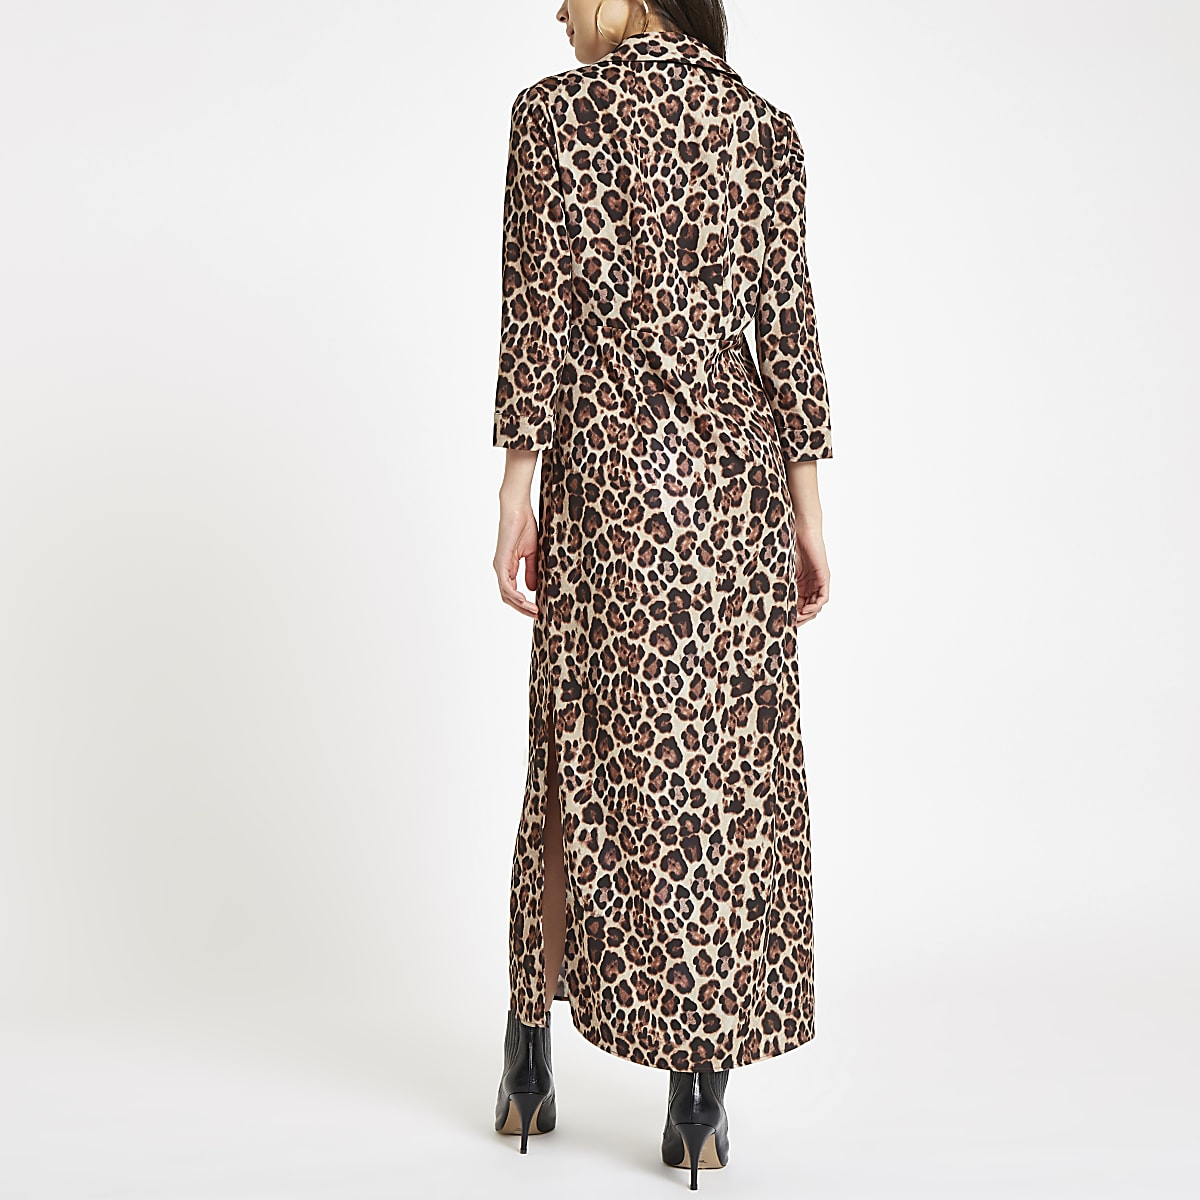 c264e4dddf Brown leopard print maxi shirt dress - Maxi Dresses - Dresses - women